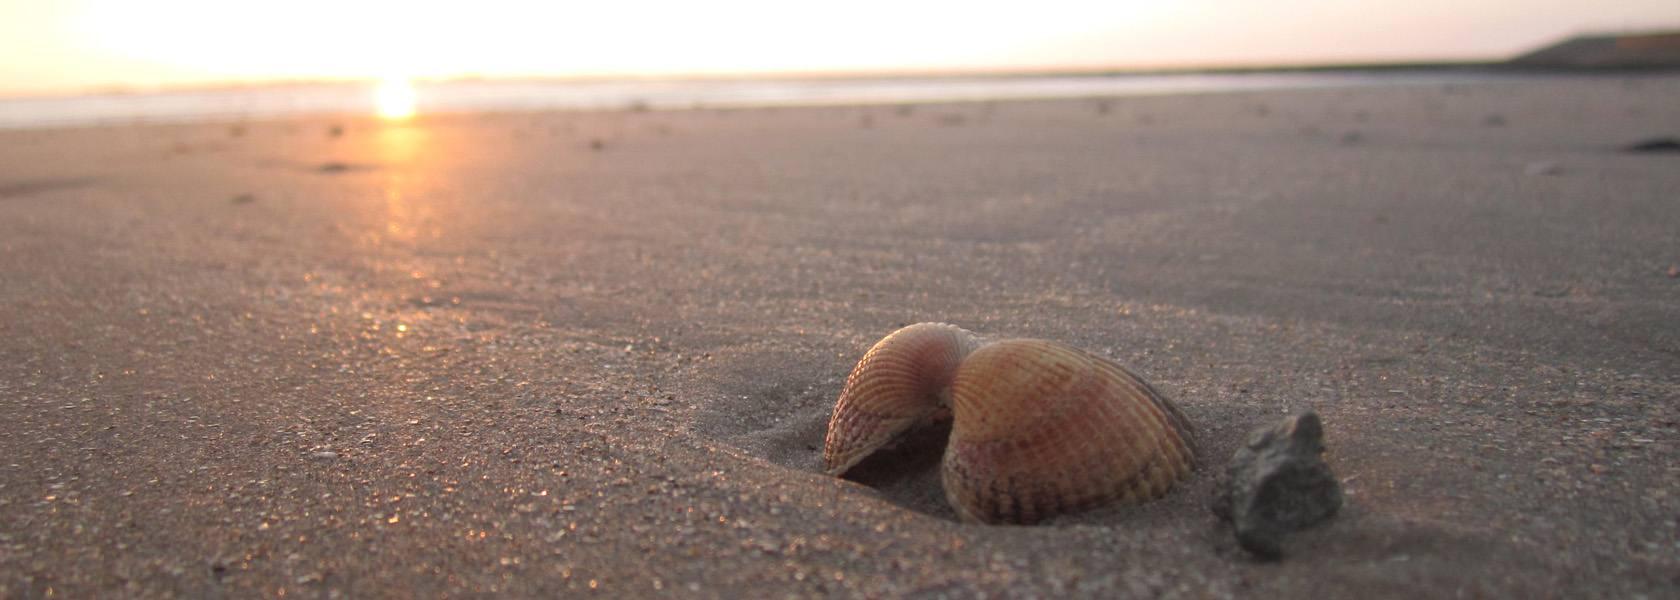 Muscheln am Strand, © Die Nordsee GmbH, Jantje Olchers